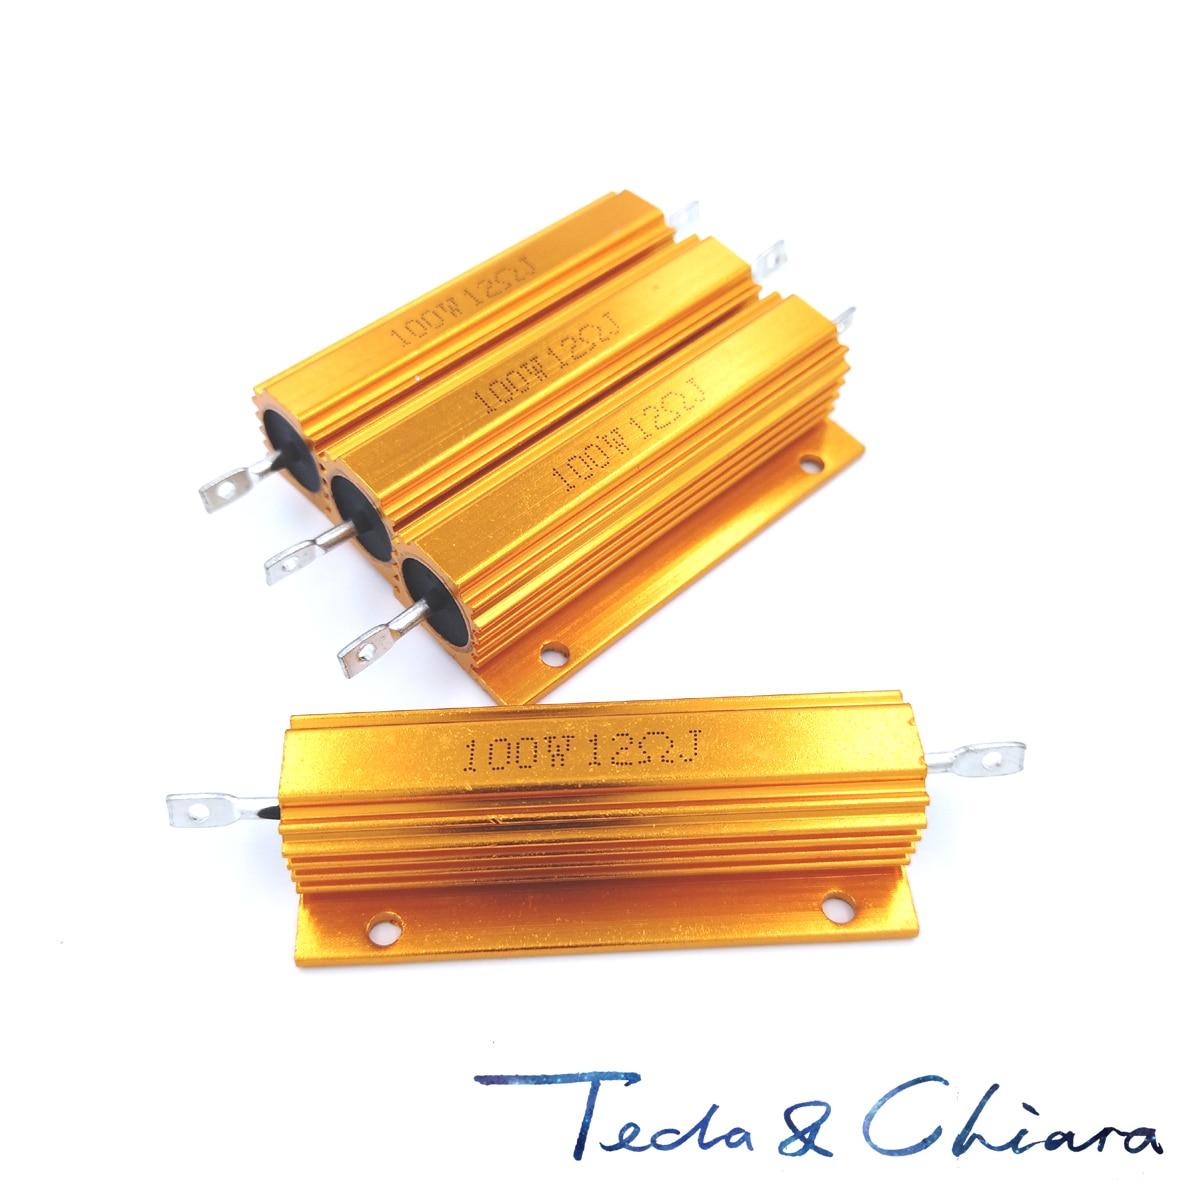 2Pcs 1.5R 1.5ohm 1.5 170R 170ohm 170 R Ohm 100W Watt Aluminum Wirewound Power Metal Shell Case Resistor Resistance RX24